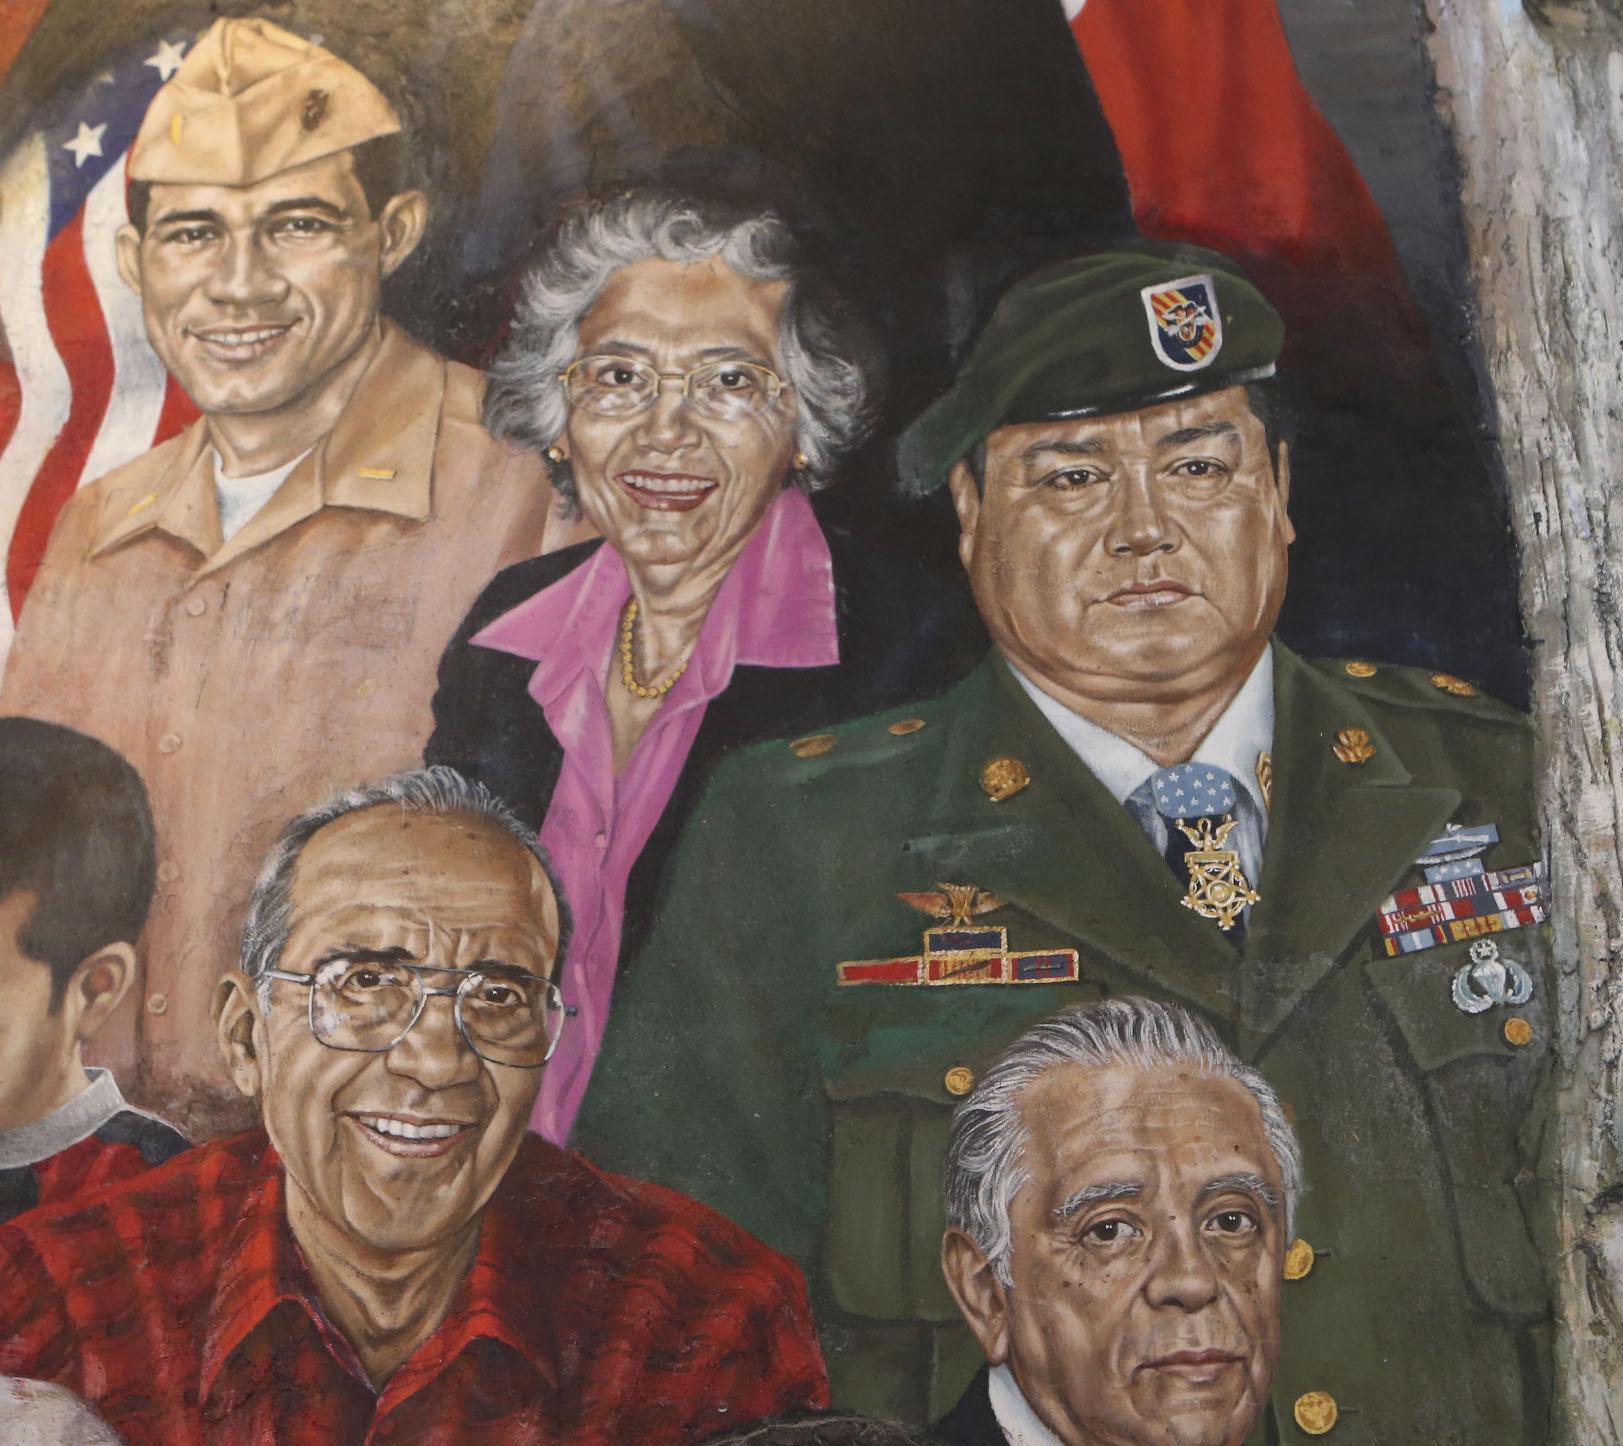 Hispanics in the military